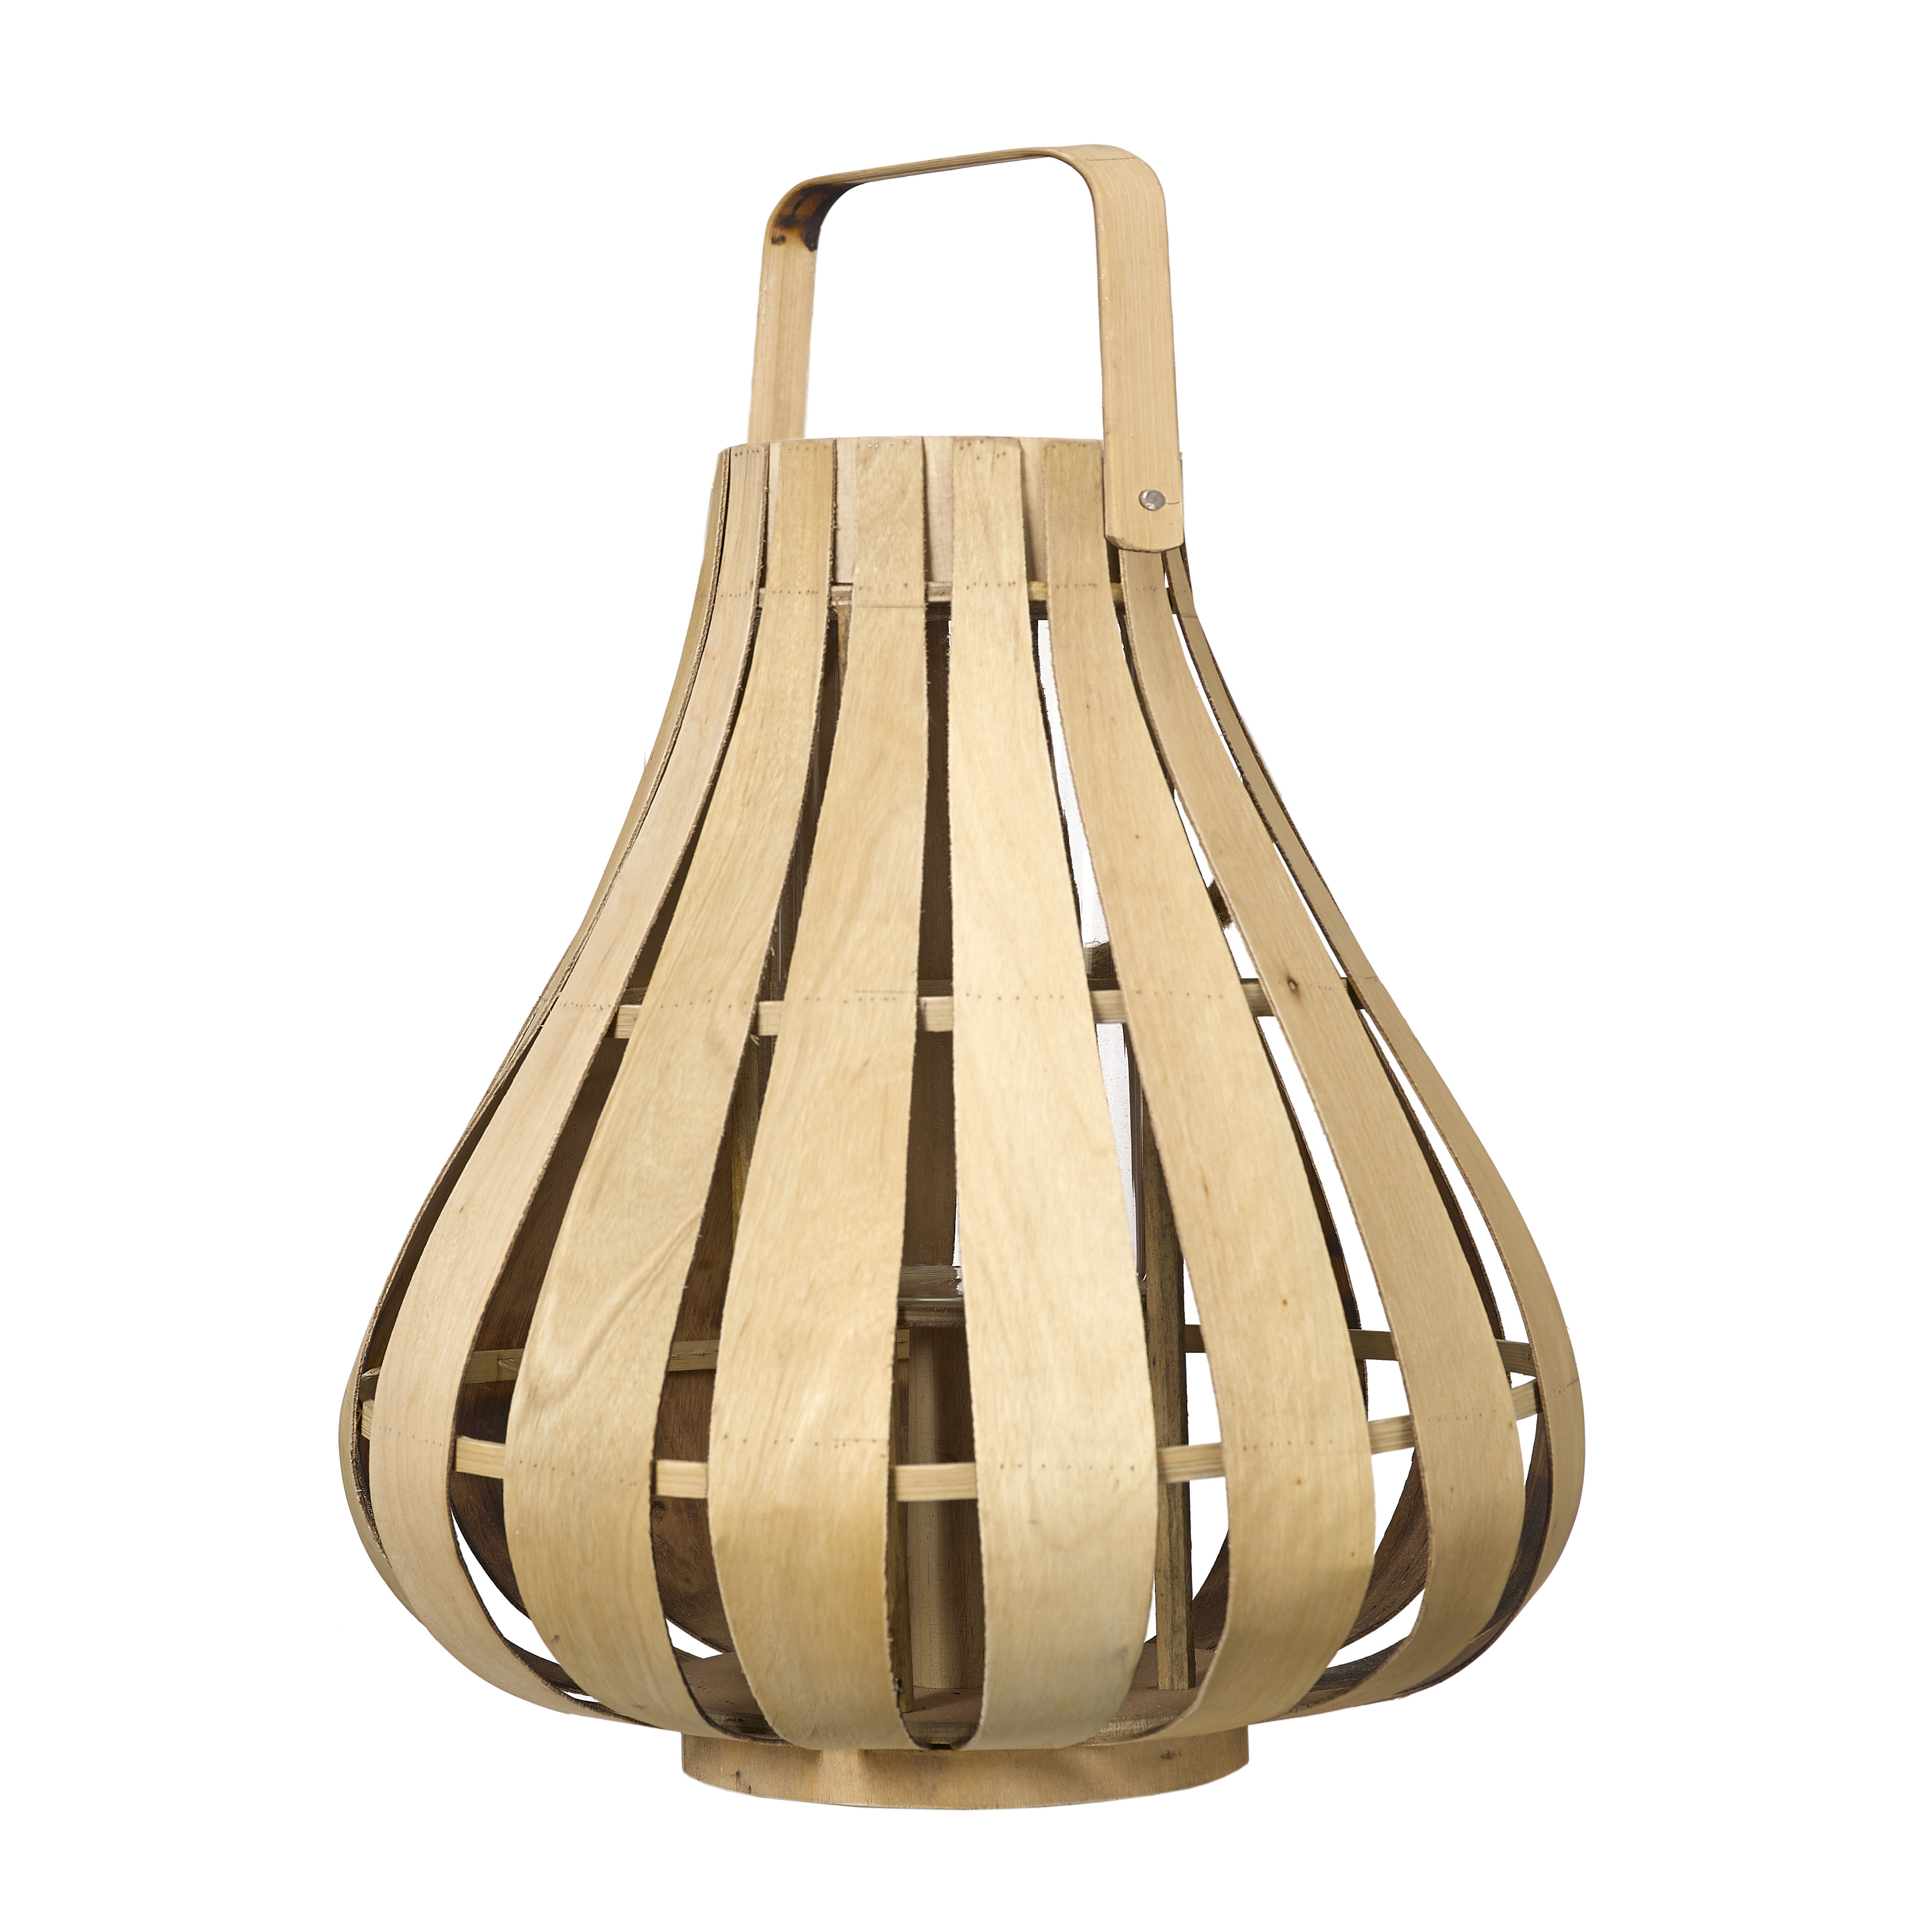 Déco - Bougeoirs, photophores - Lanterne Vertical Strip Small / Bambou - Ø 39 x H 42 cm - Pols Potten - Vertical / Bambou - Bambou, Verre